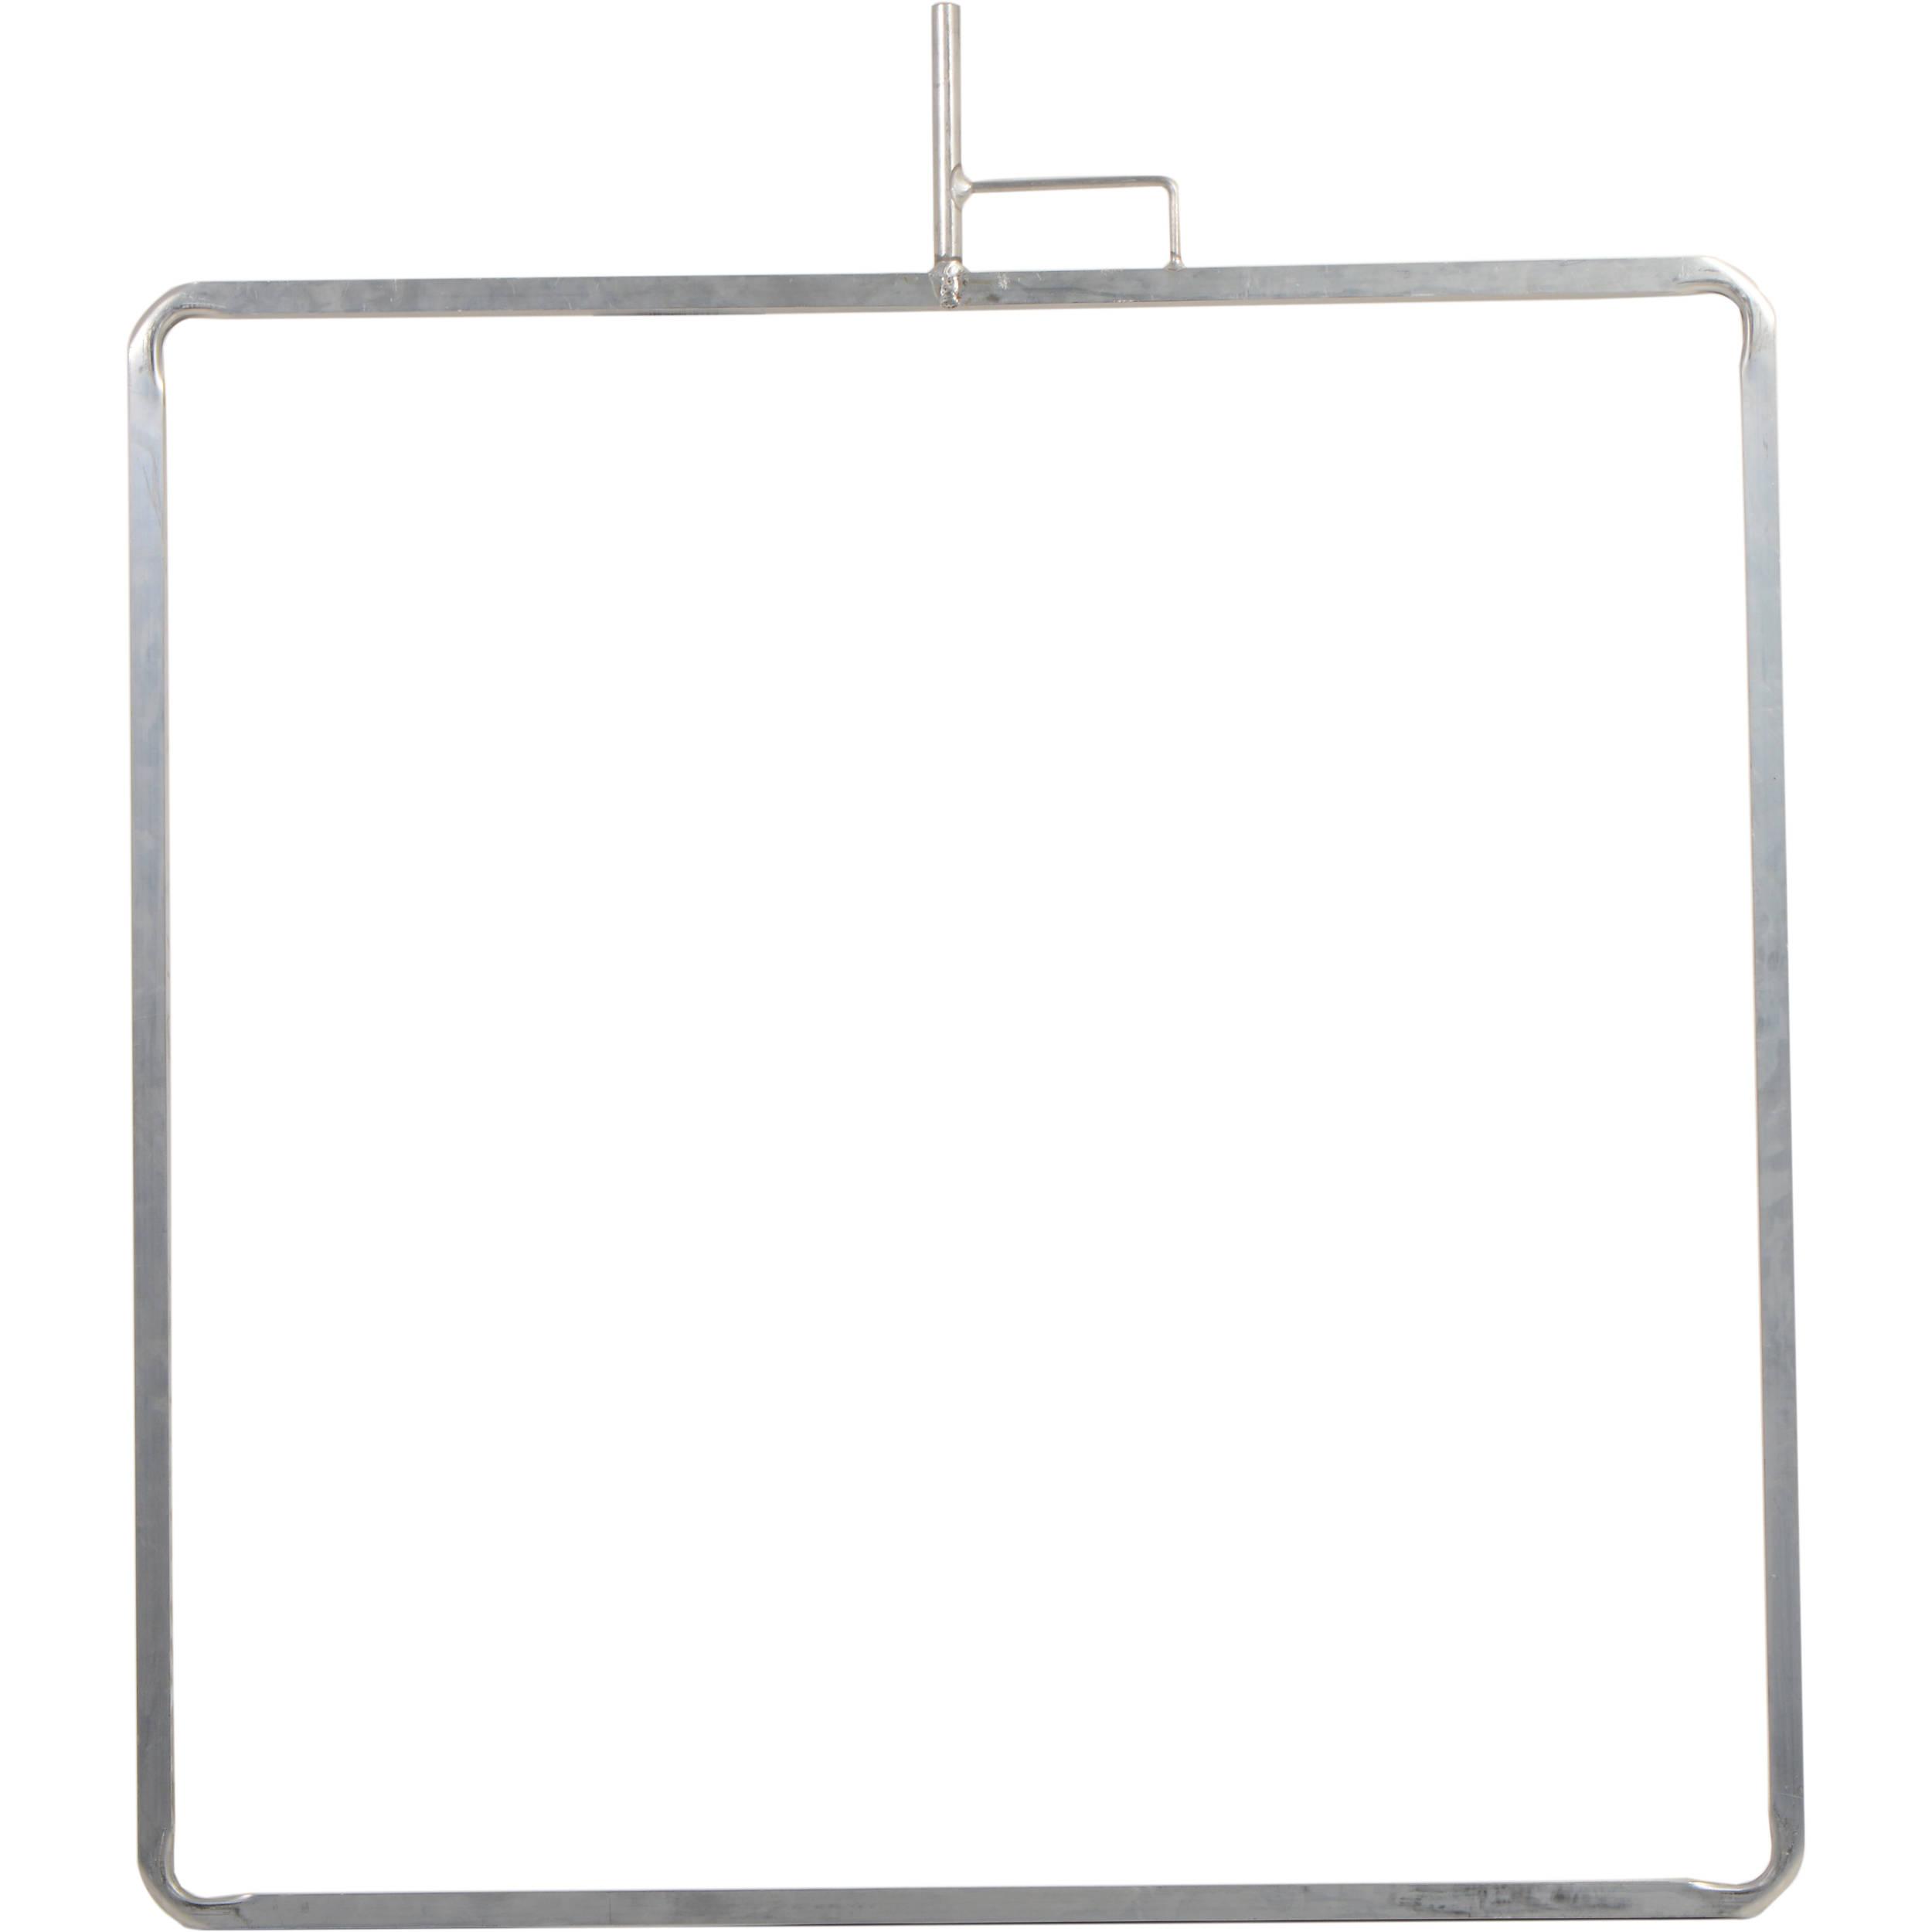 4'x4' Frames